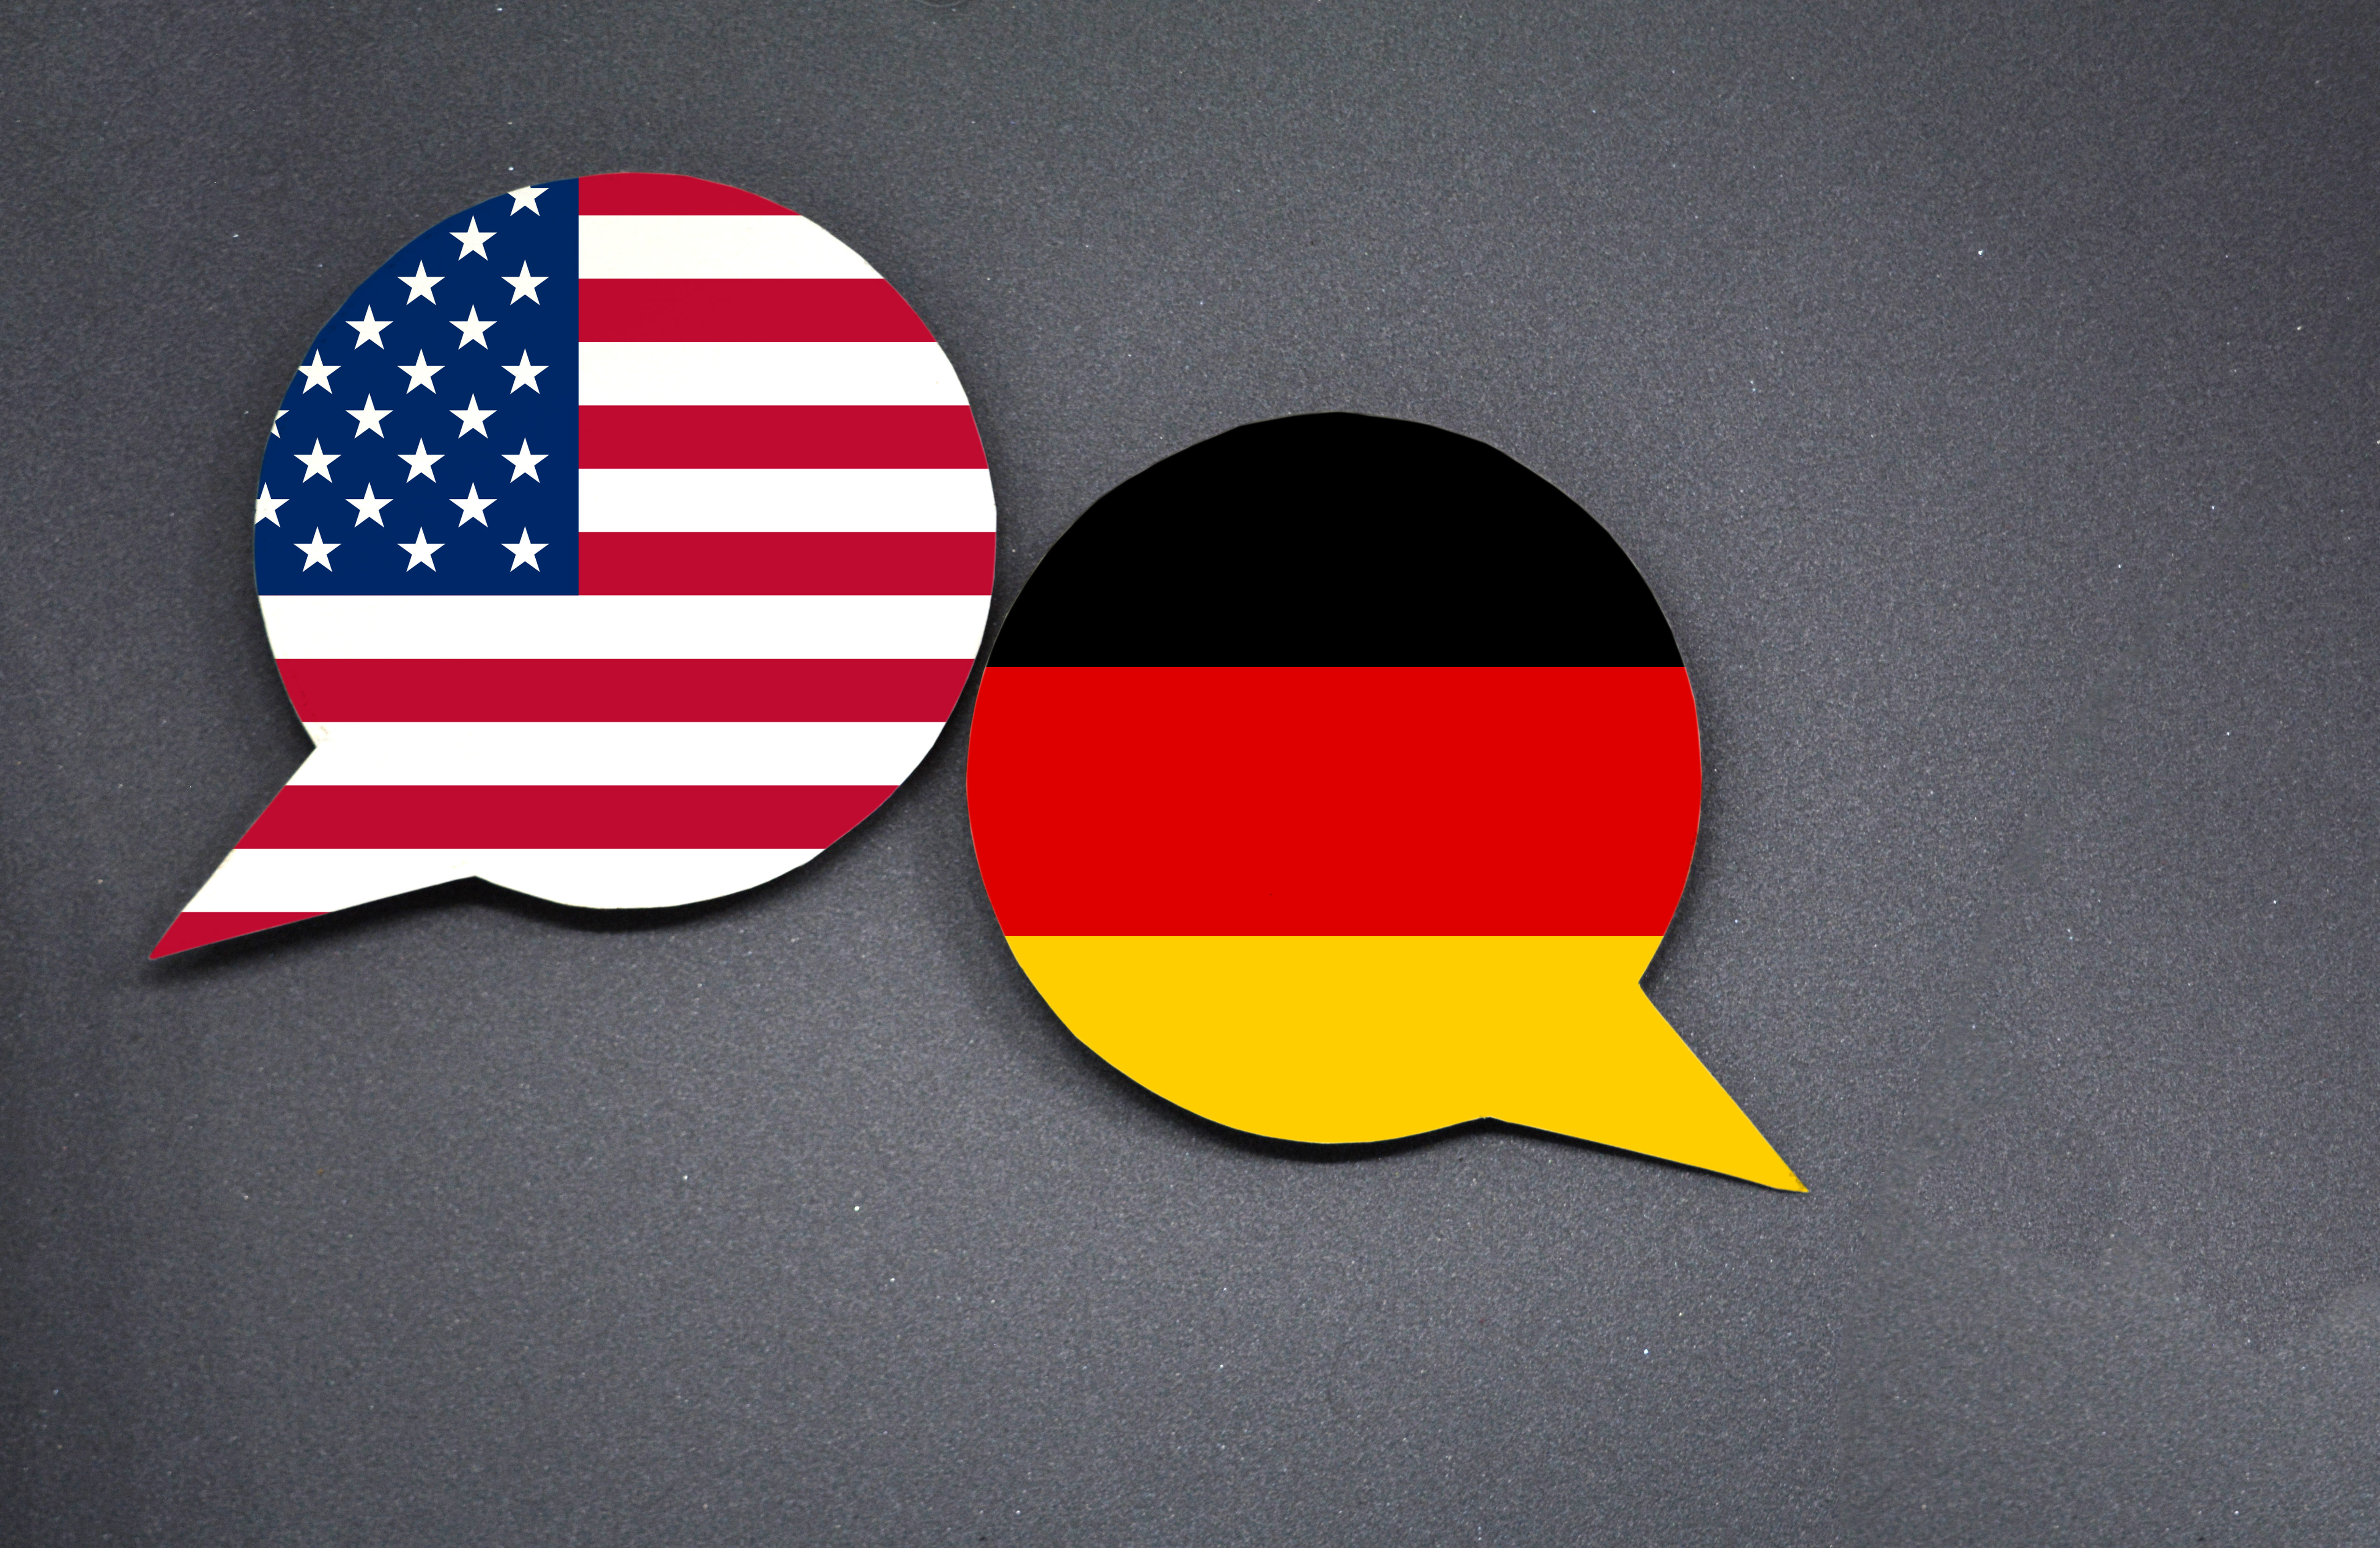 Bilingual Awkward Facts